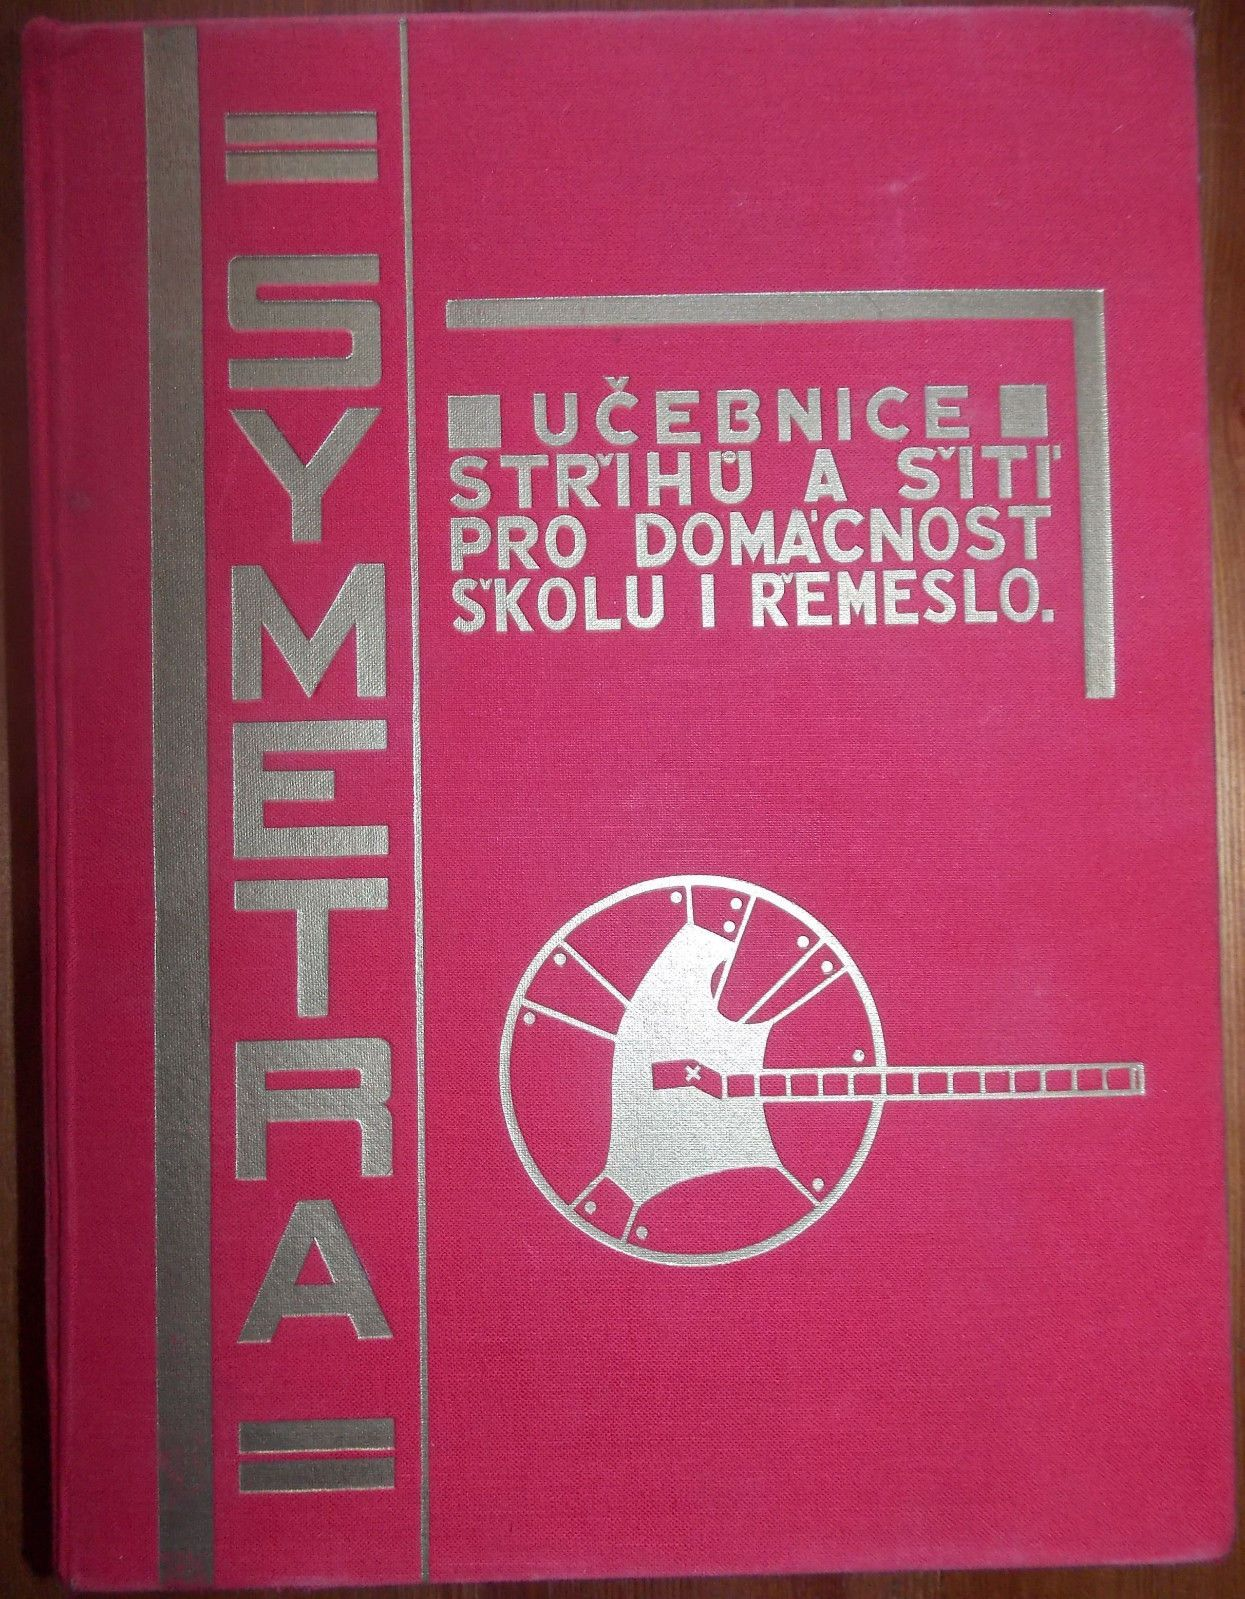 RARE Lutterloh Patterns Books Symetra 1932 The Golden Rule ...